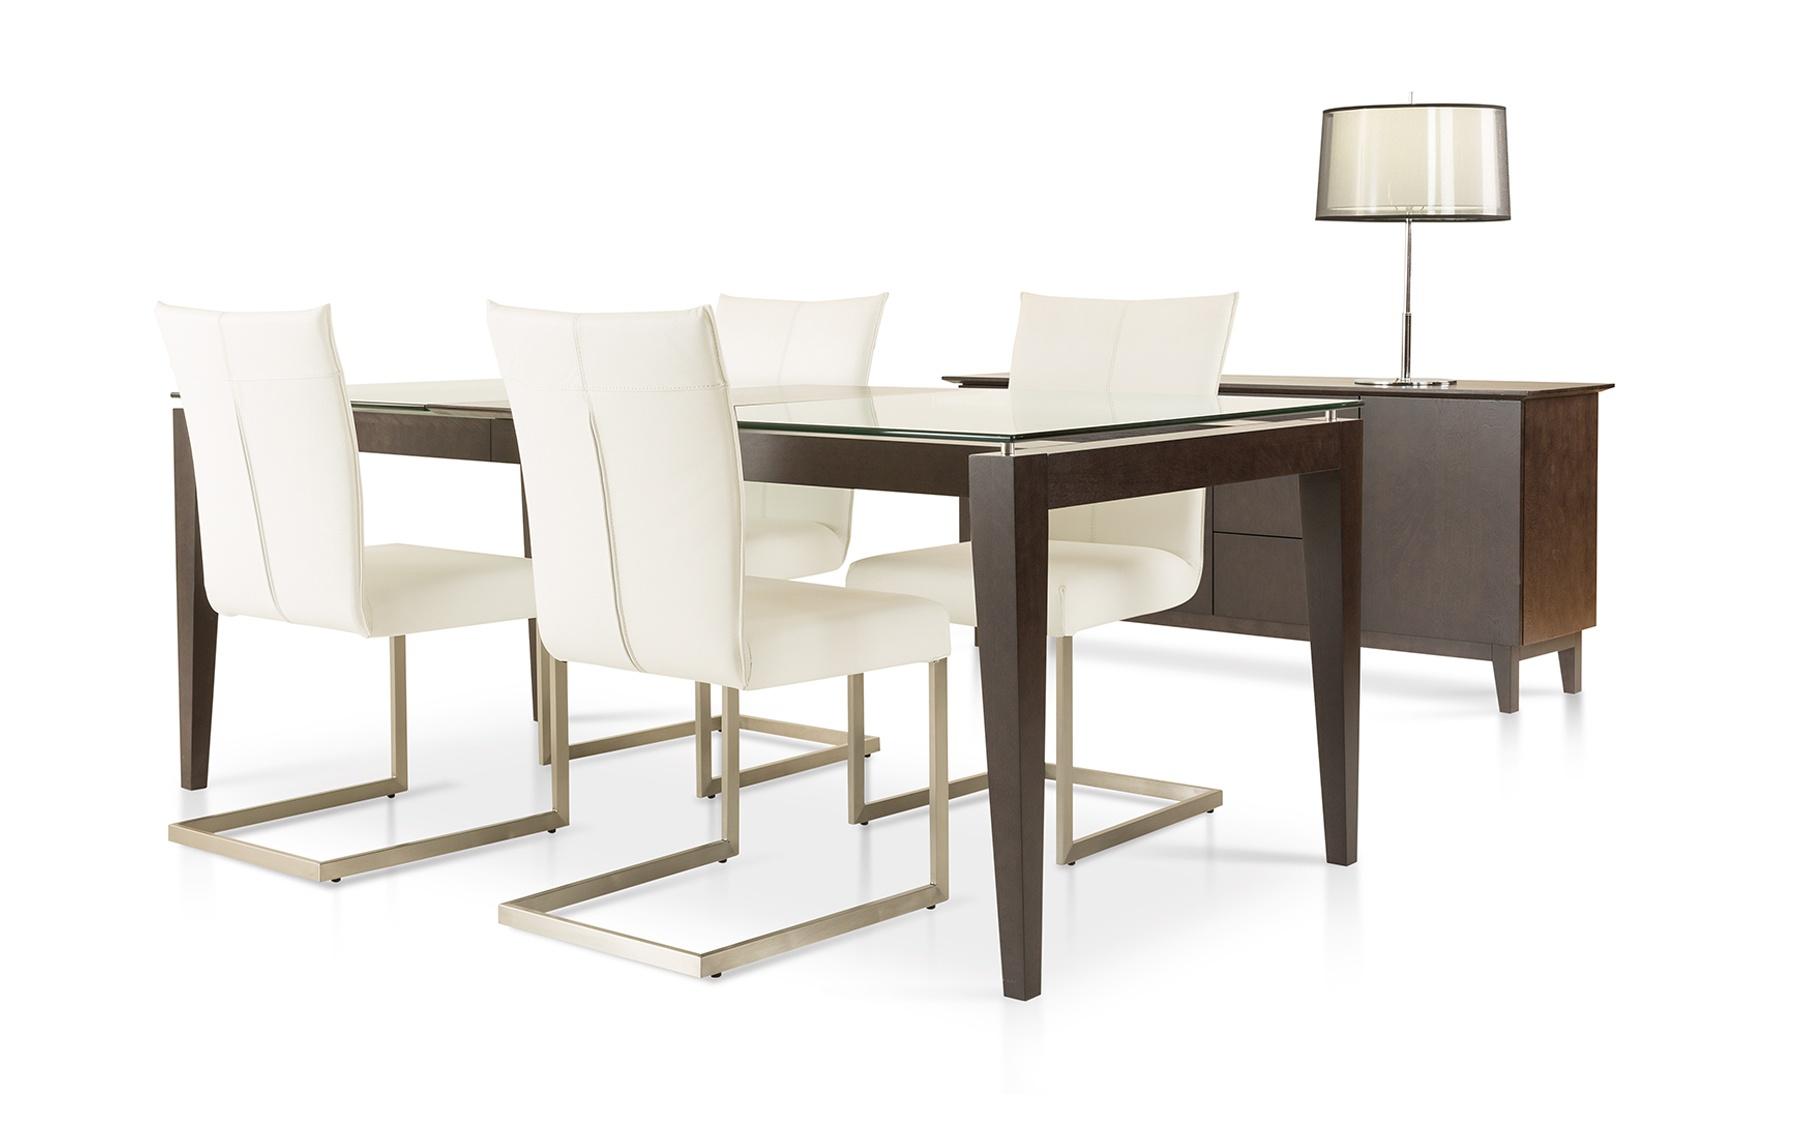 table 38x60 1 extension 18 co526 tables salles manger la galerie du meuble. Black Bedroom Furniture Sets. Home Design Ideas